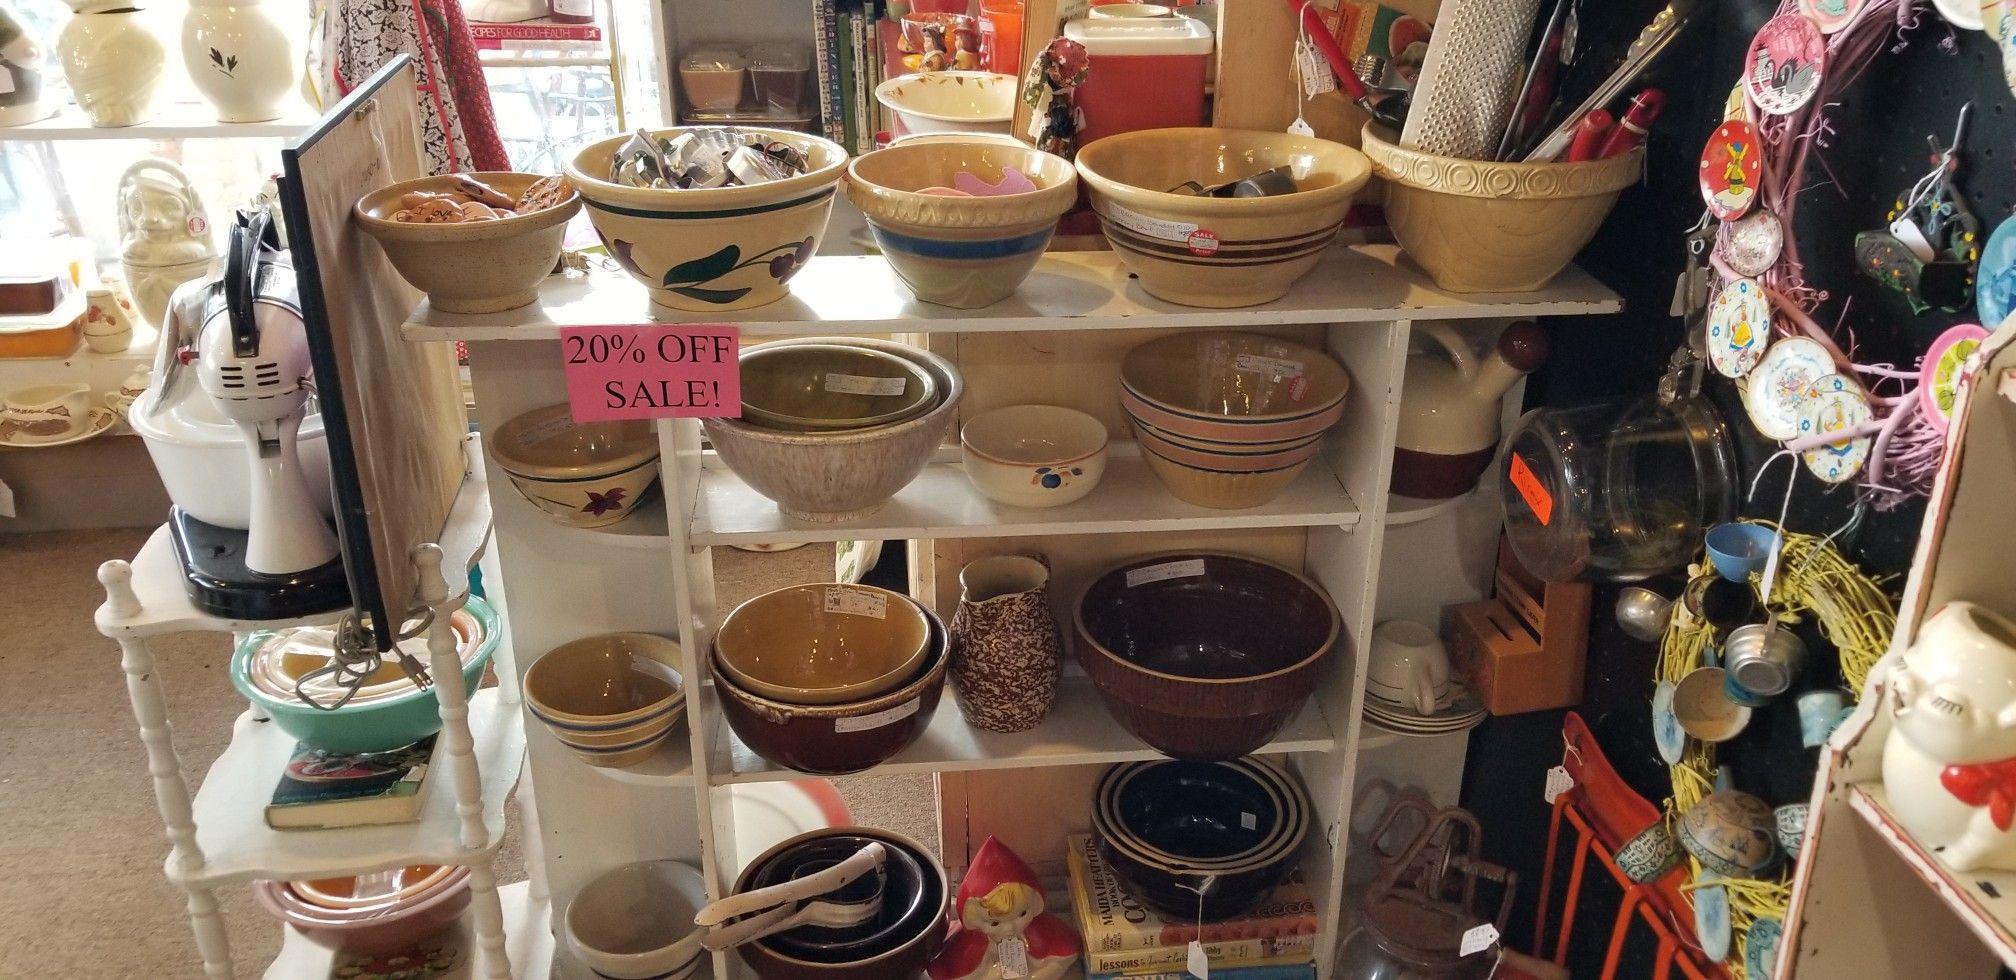 Vintage Bowls In 2020 Vintage Bowls Naperville Illinois Bowl